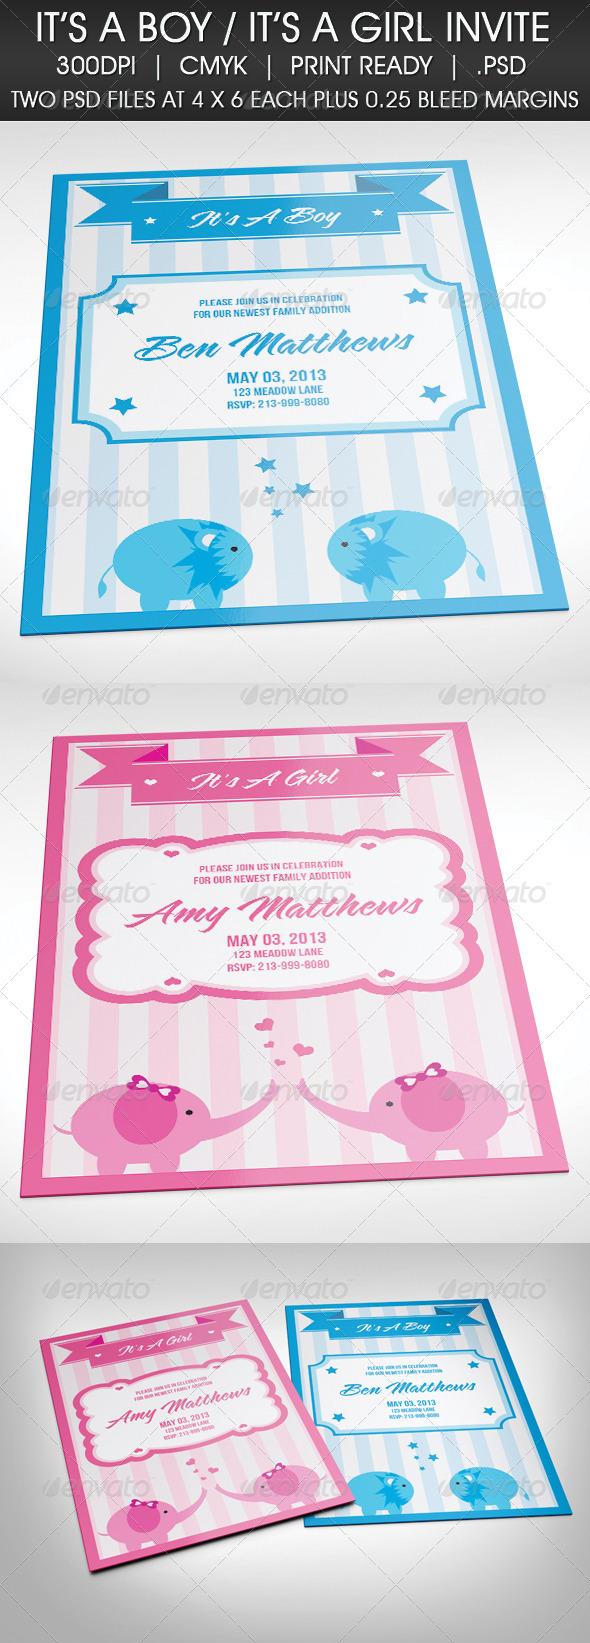 GraphicRiver It s A Boy It s A Girl Baby Celebration Invite 4169359